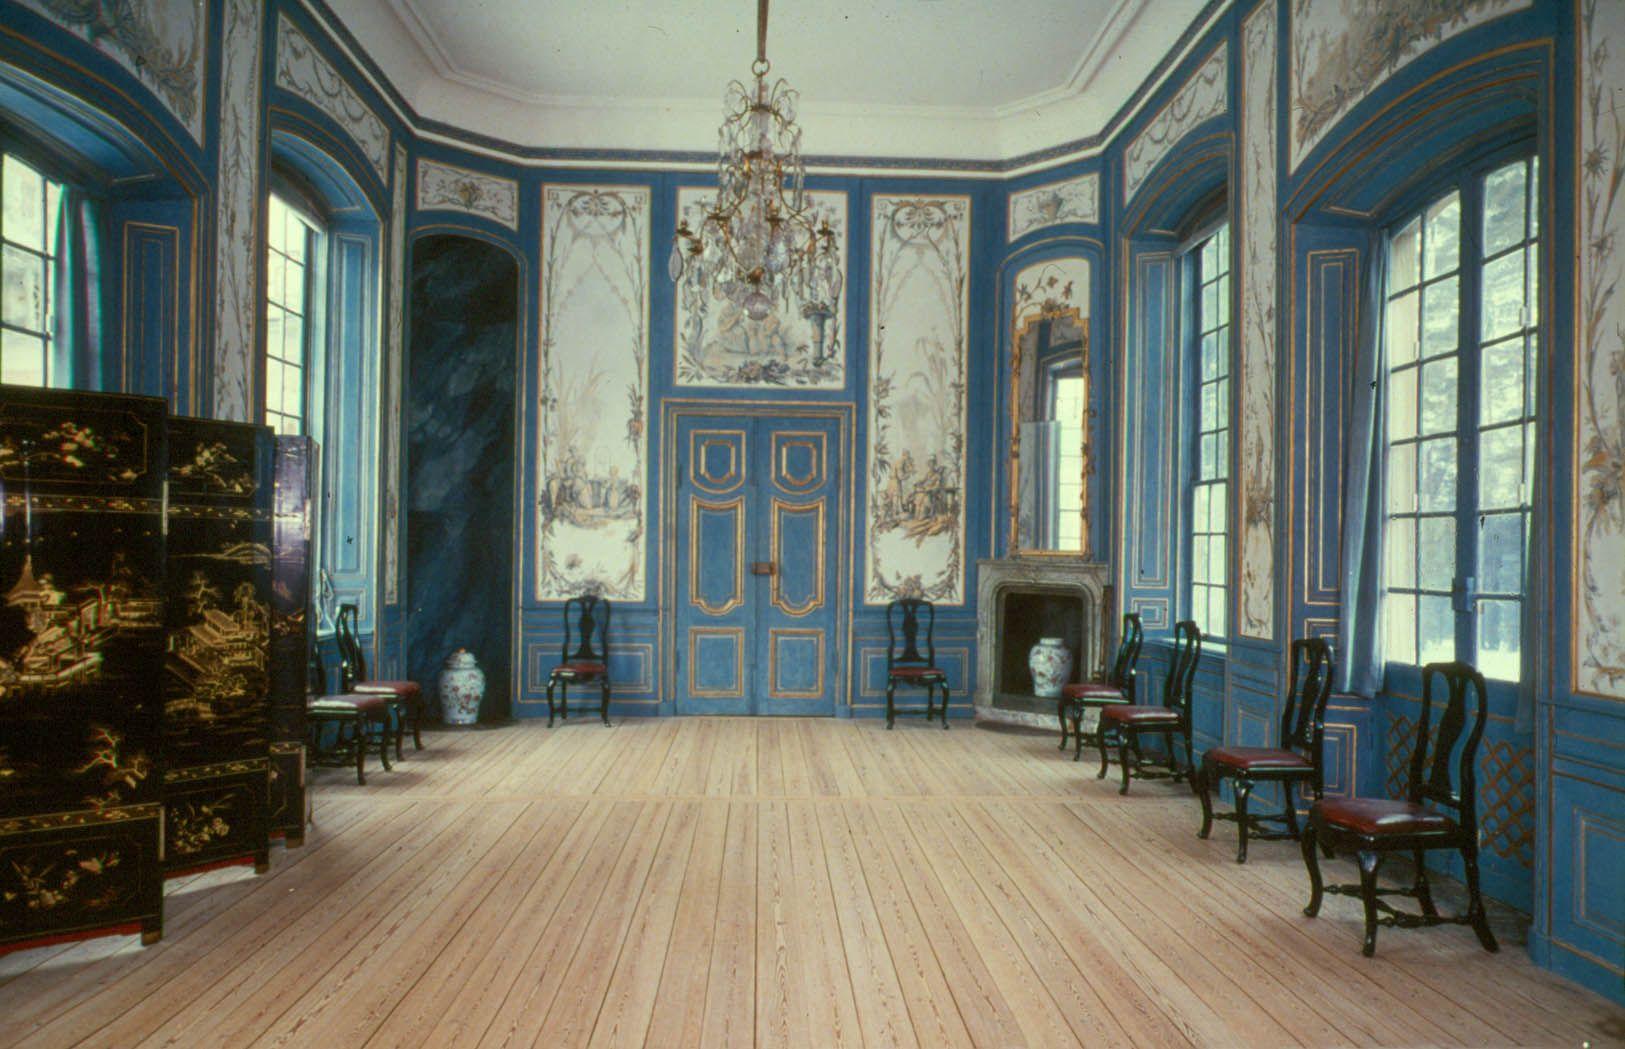 Pin By Maj Britt Burling On Swedish Rooms And Houses Pavillion Swedish Interiors Palace Interior